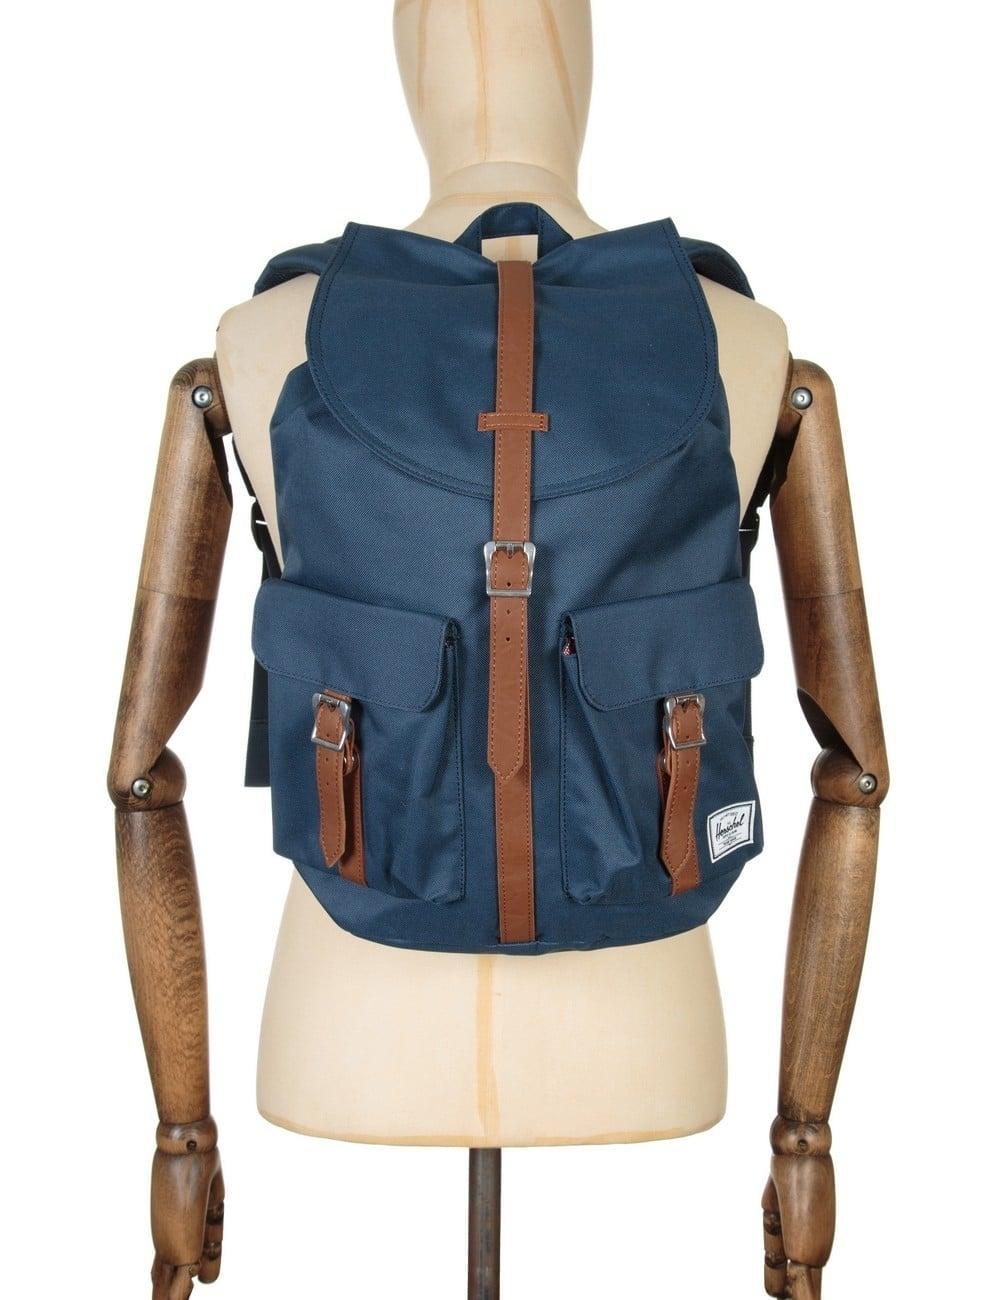 d1245077efd Herschel Supply Co Dawson 20.5L Backpack - Navy Tan - Accessories ...